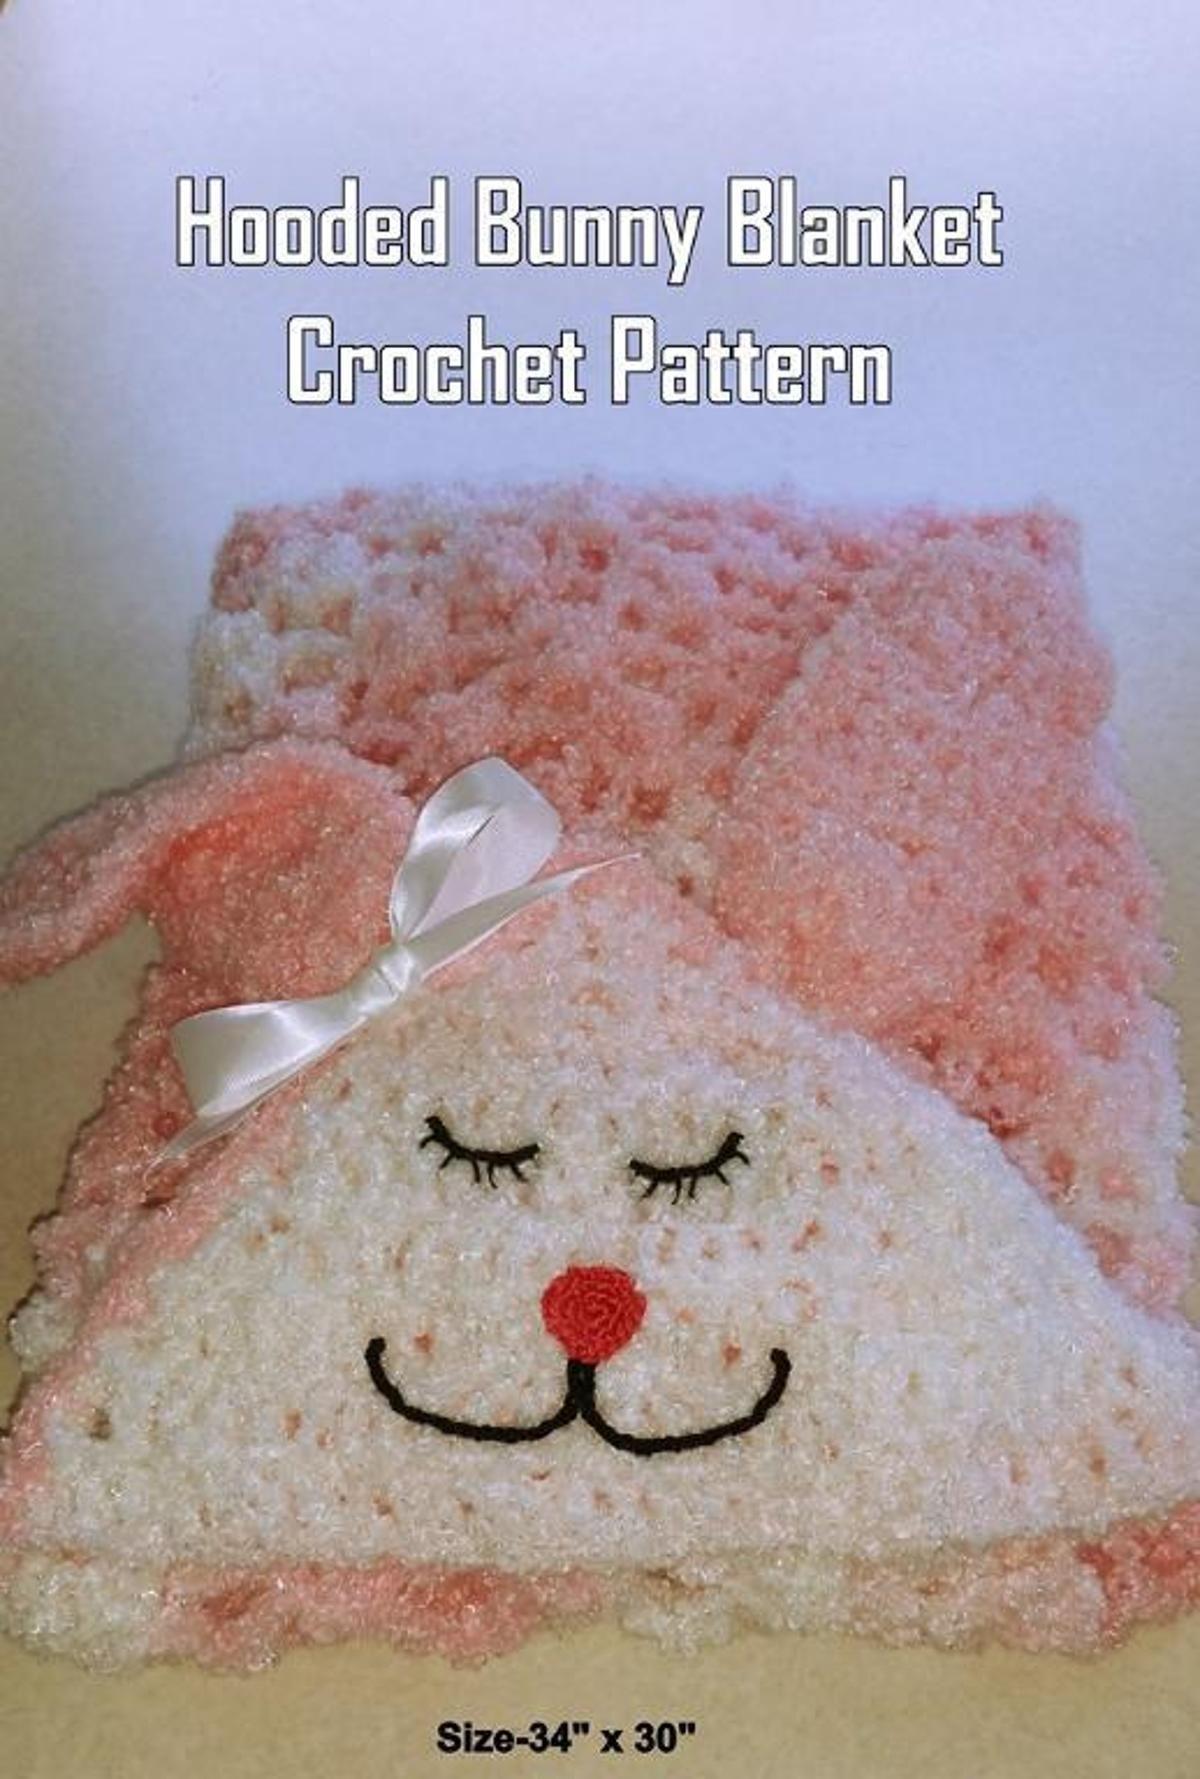 Hooded Bunny Blanket Crochet Pattern   Craftsy